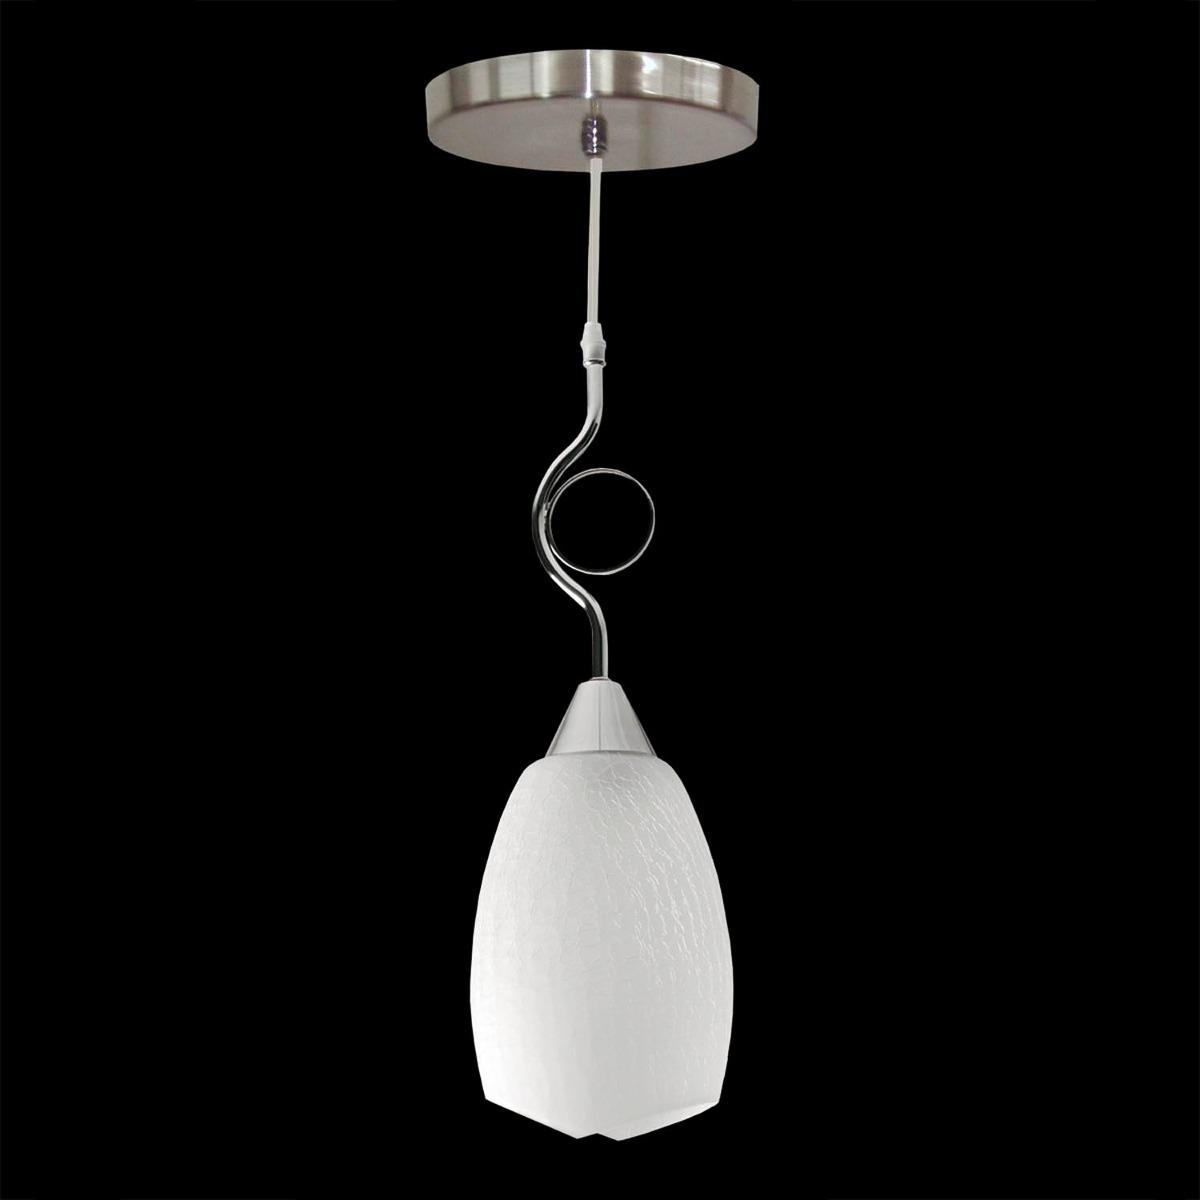 Lustre Pendente Design TD 2002 Branco Taschibra